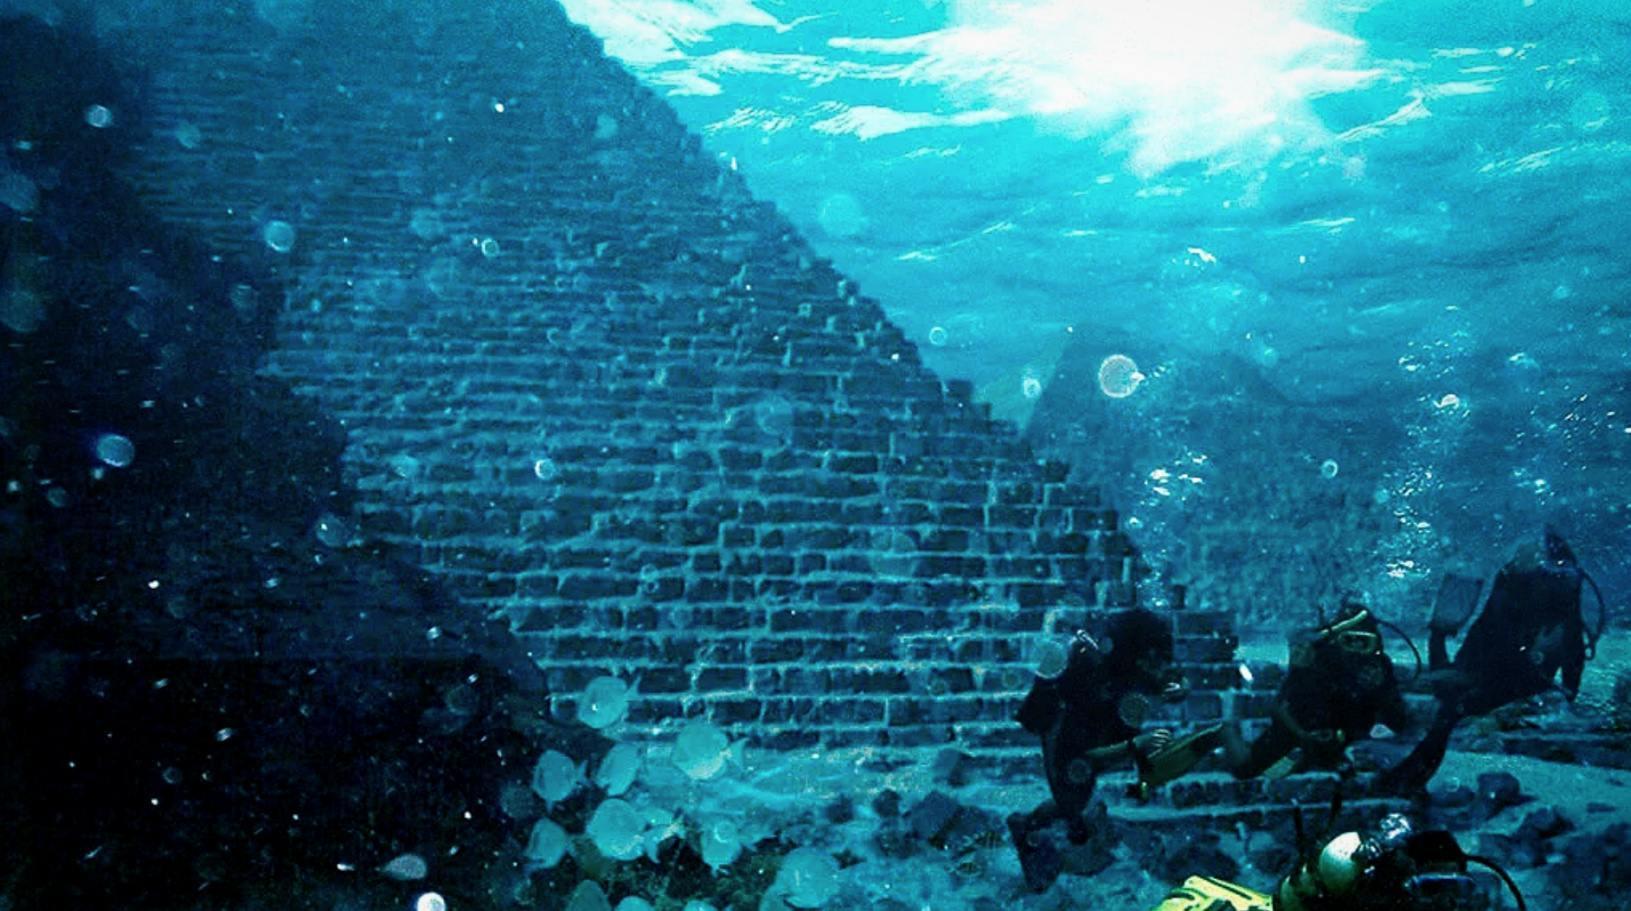 Azores underwater pyramid